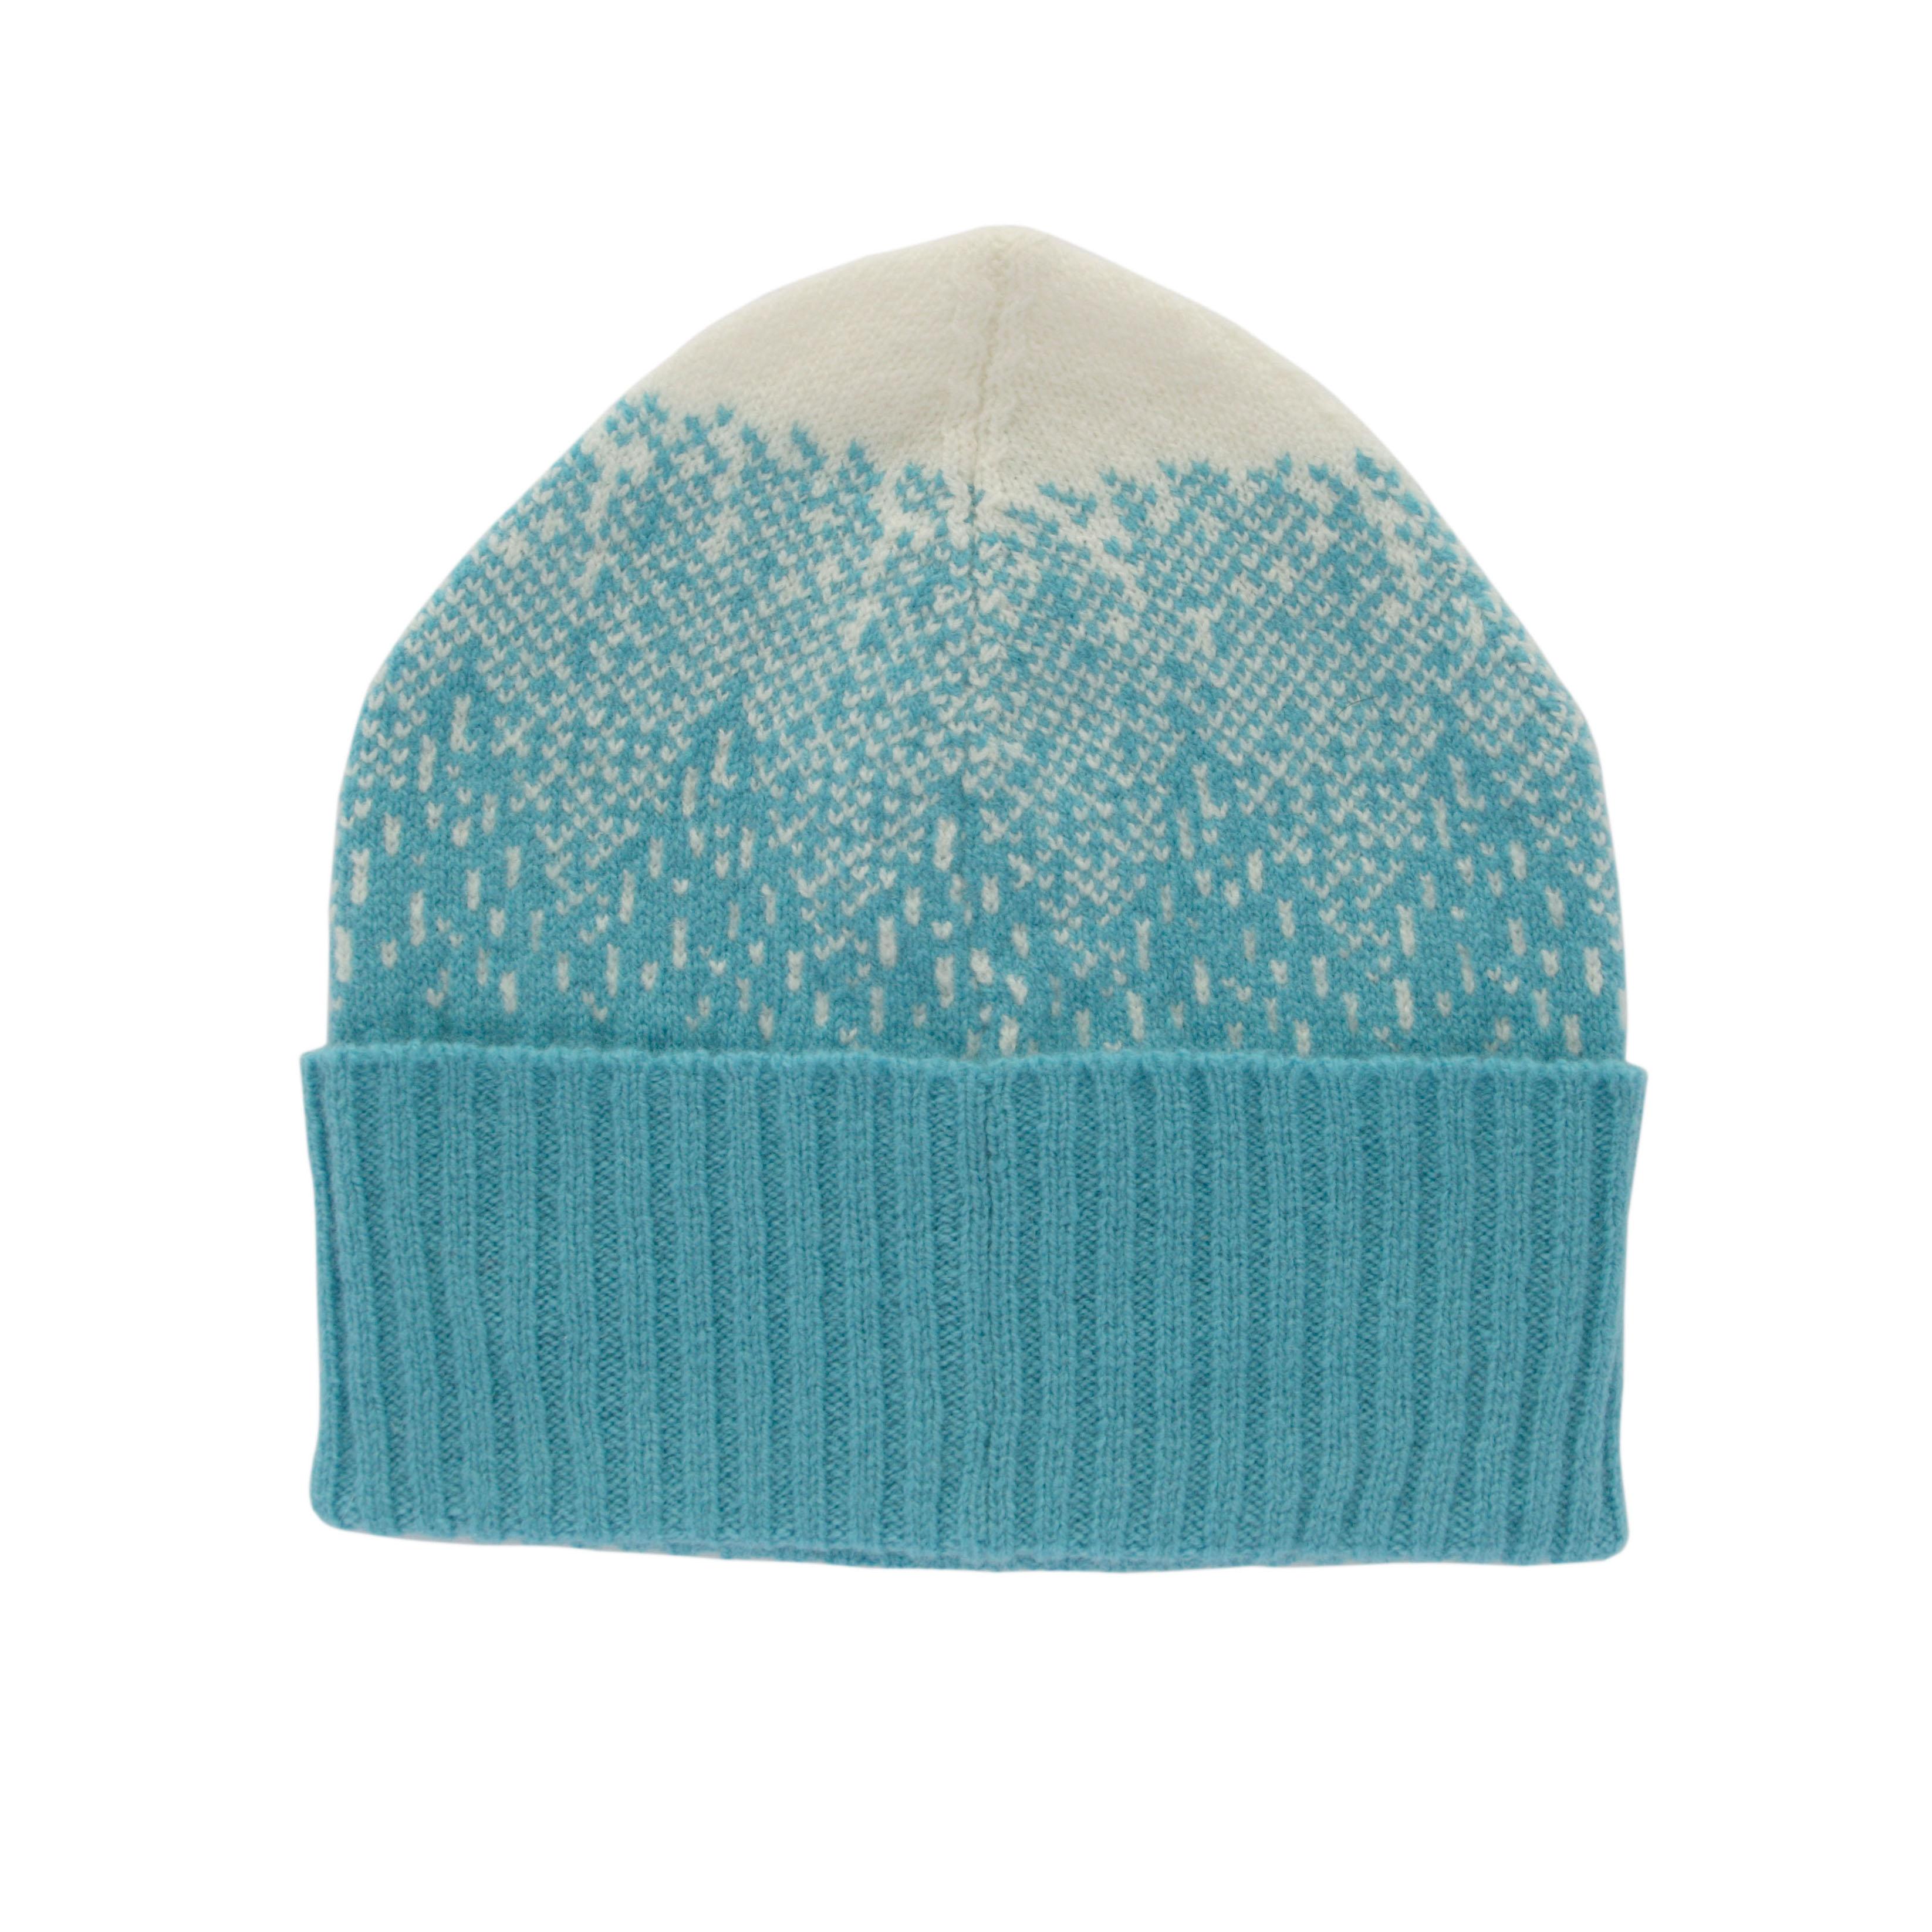 Donna Wilson - Mountain Peaks Hat - Blue White